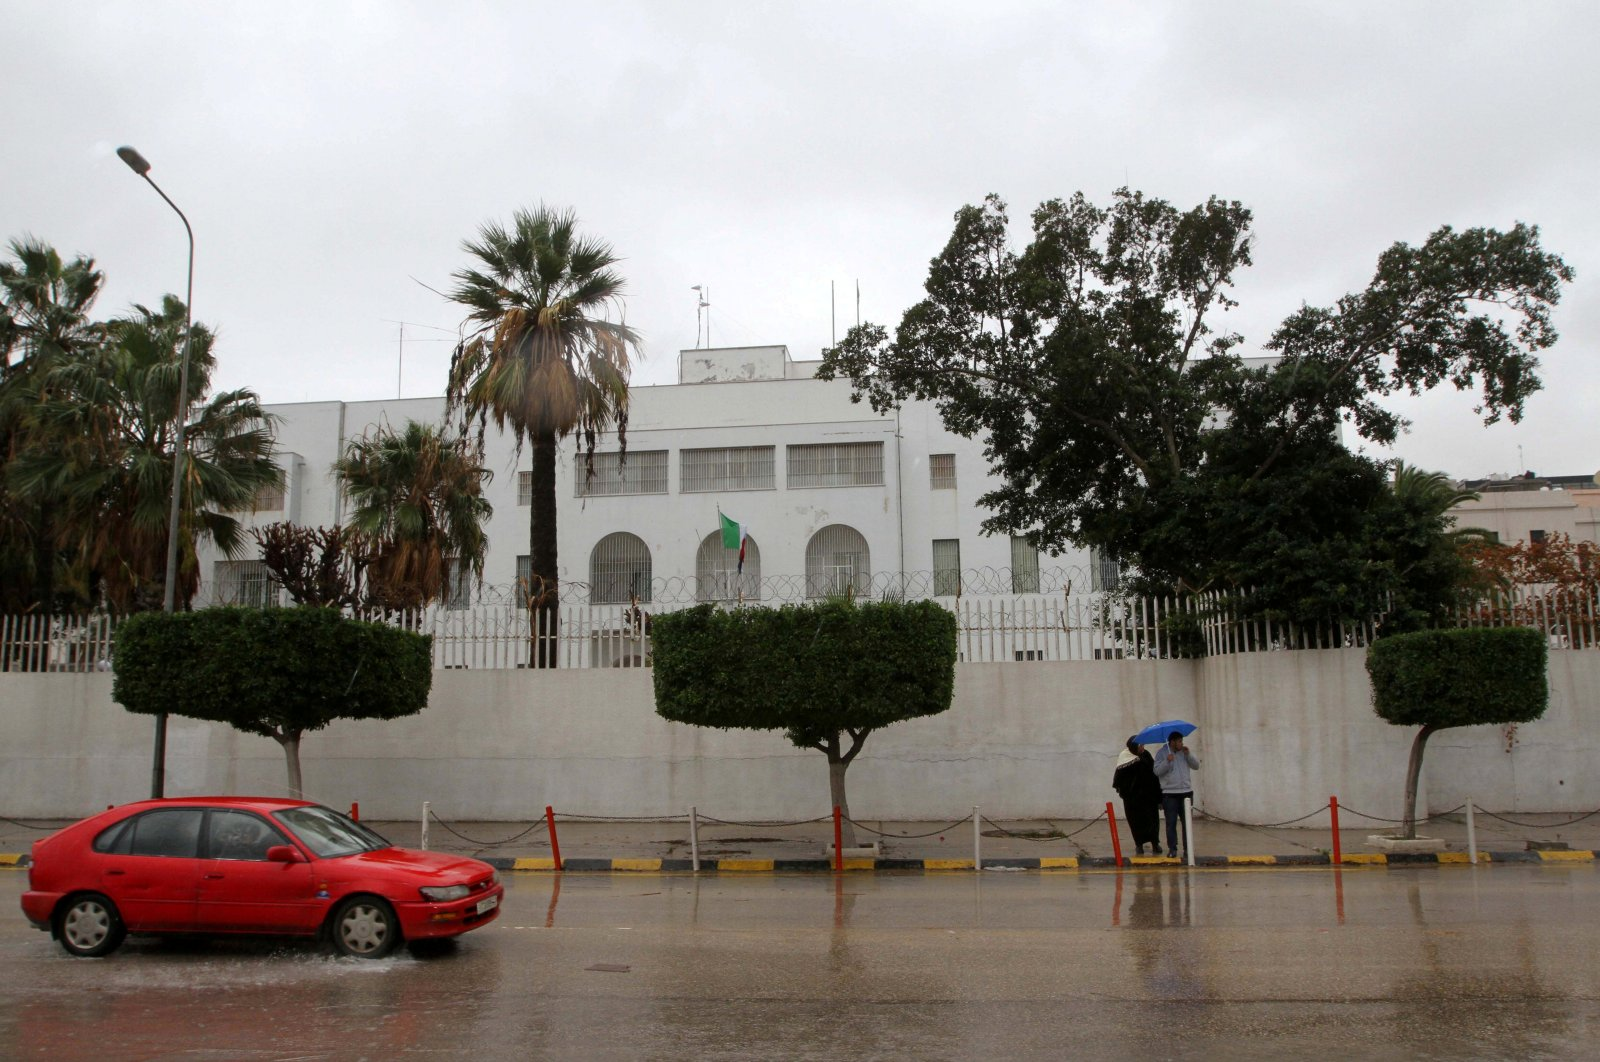 A car drives past the Italian Embassy in Tripoli, Libya, Jan. 10, 2017. (Reuters File Photo)